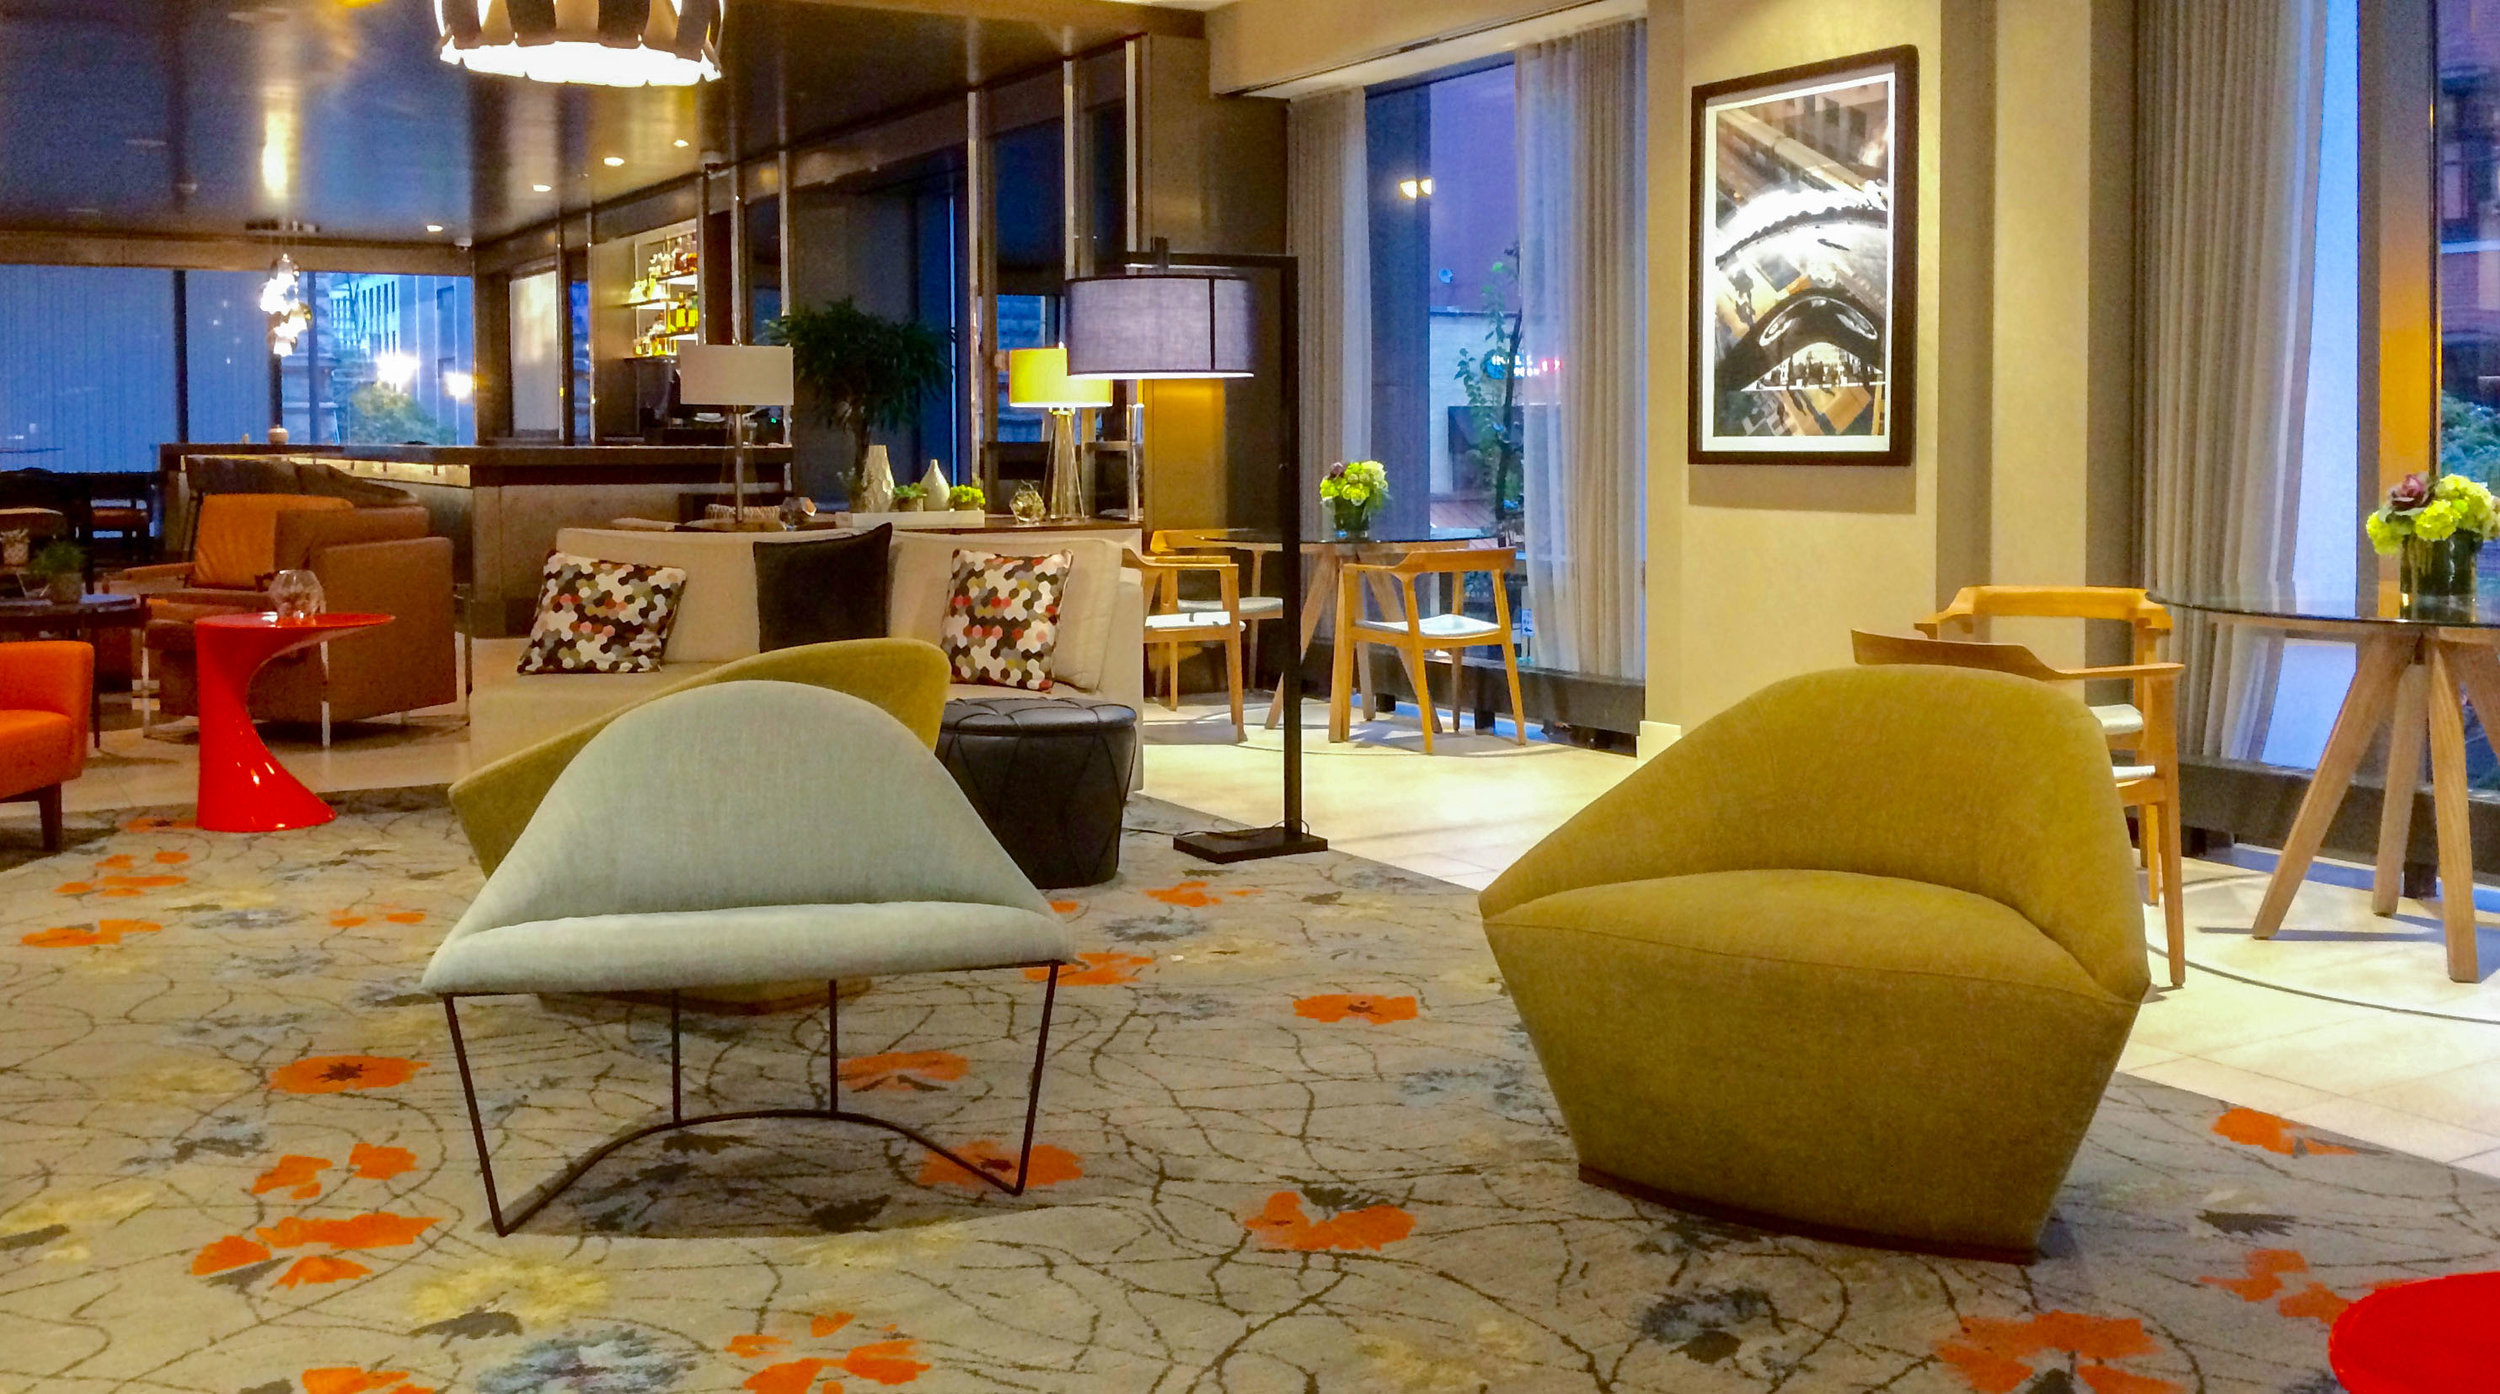 Marriott SpringHill Suites Chicago. Photo: Johanna Read